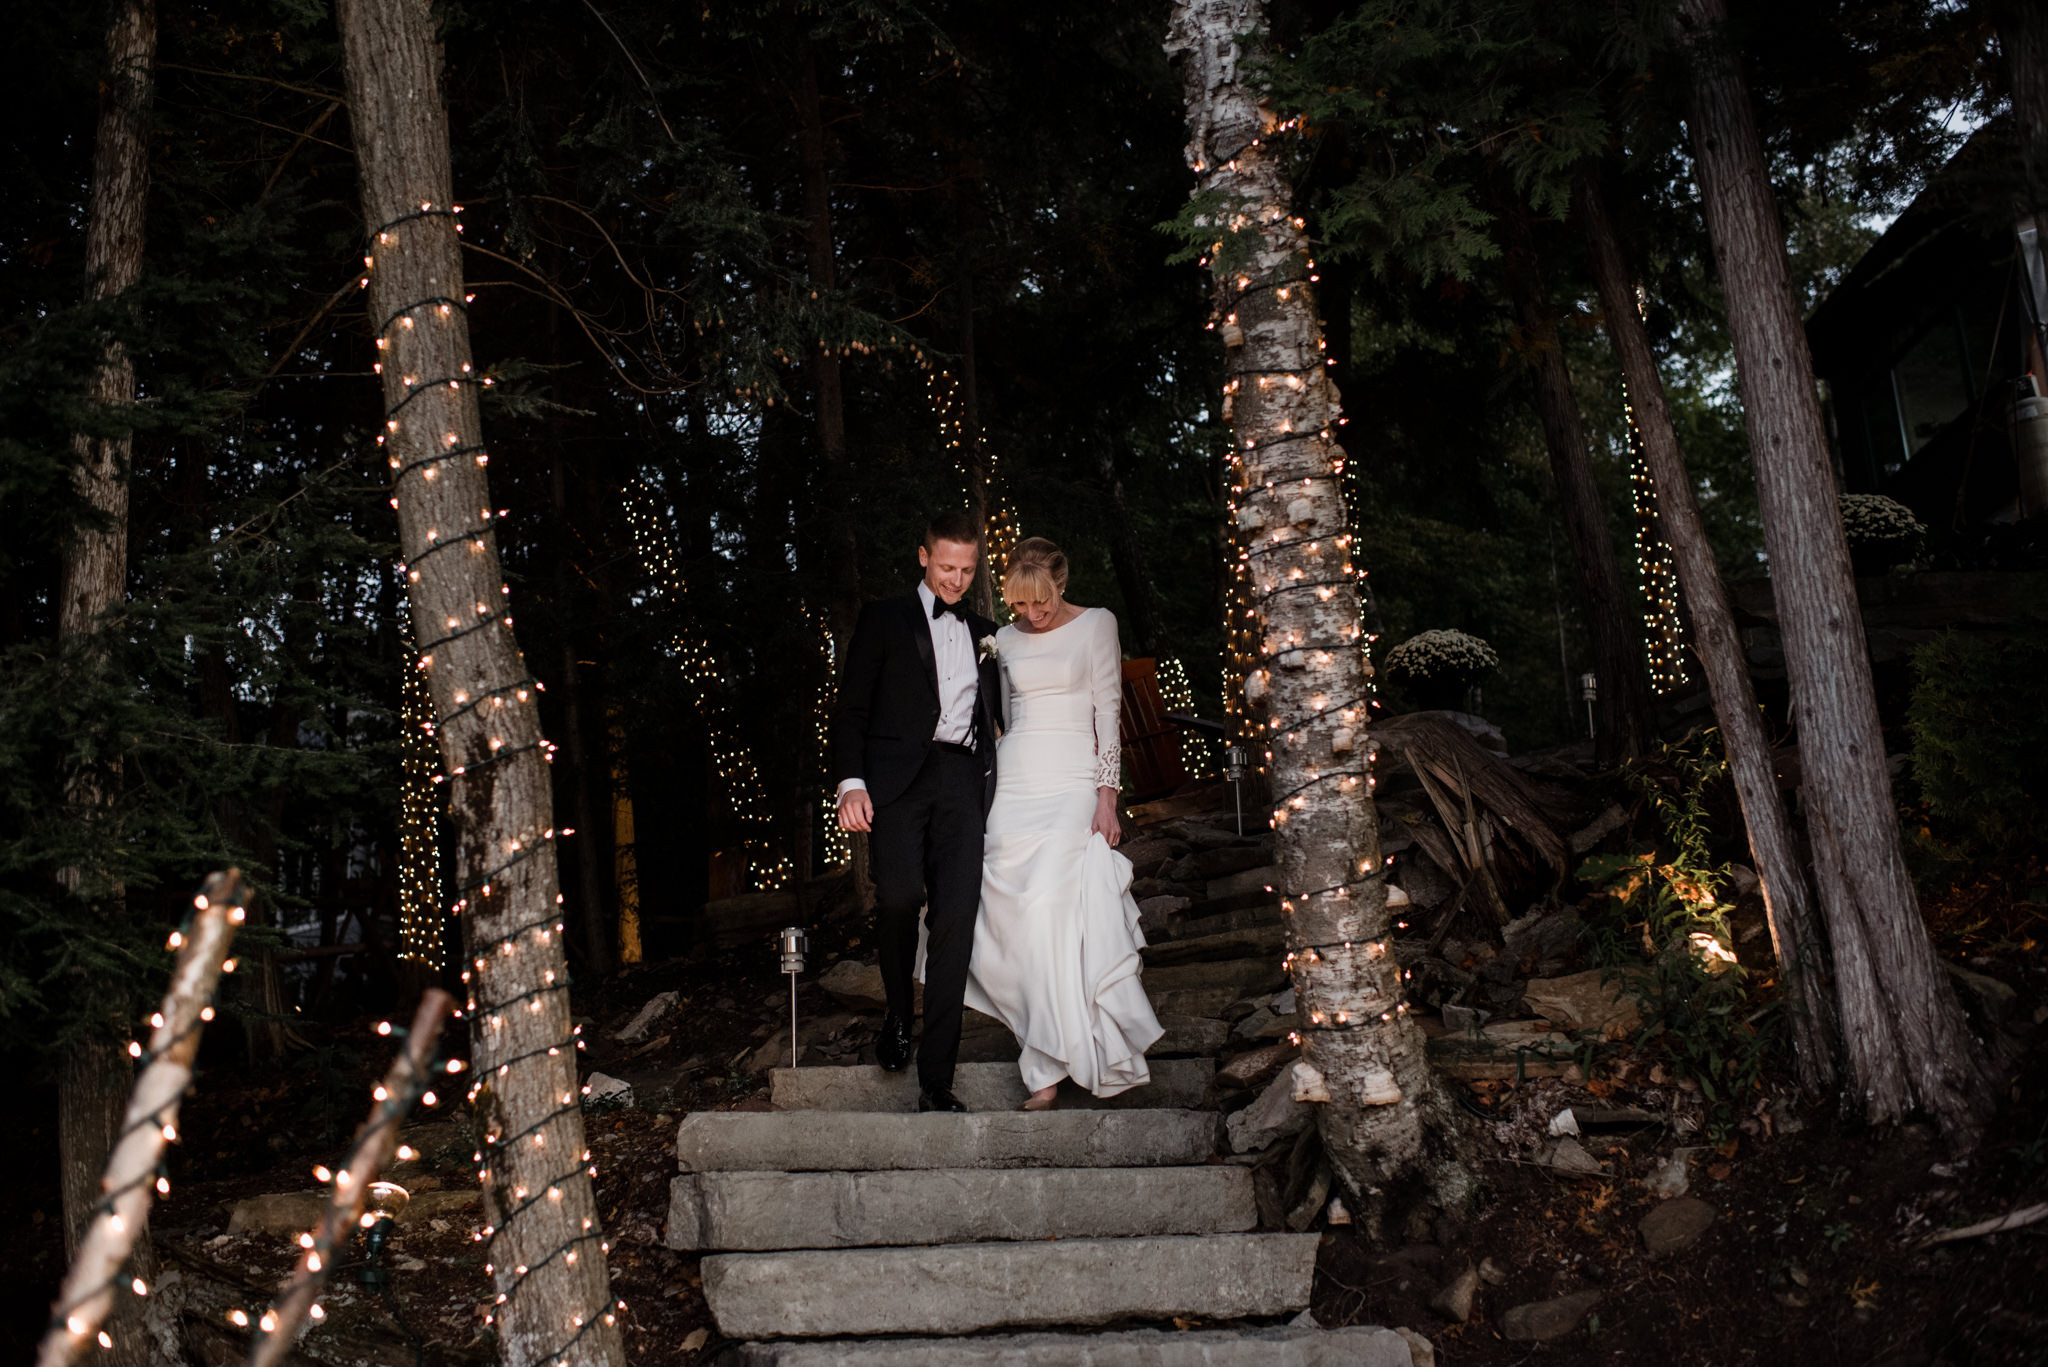 015-romantic-toronto-wedding-photographer-ontario-cottage-sunset.jpg